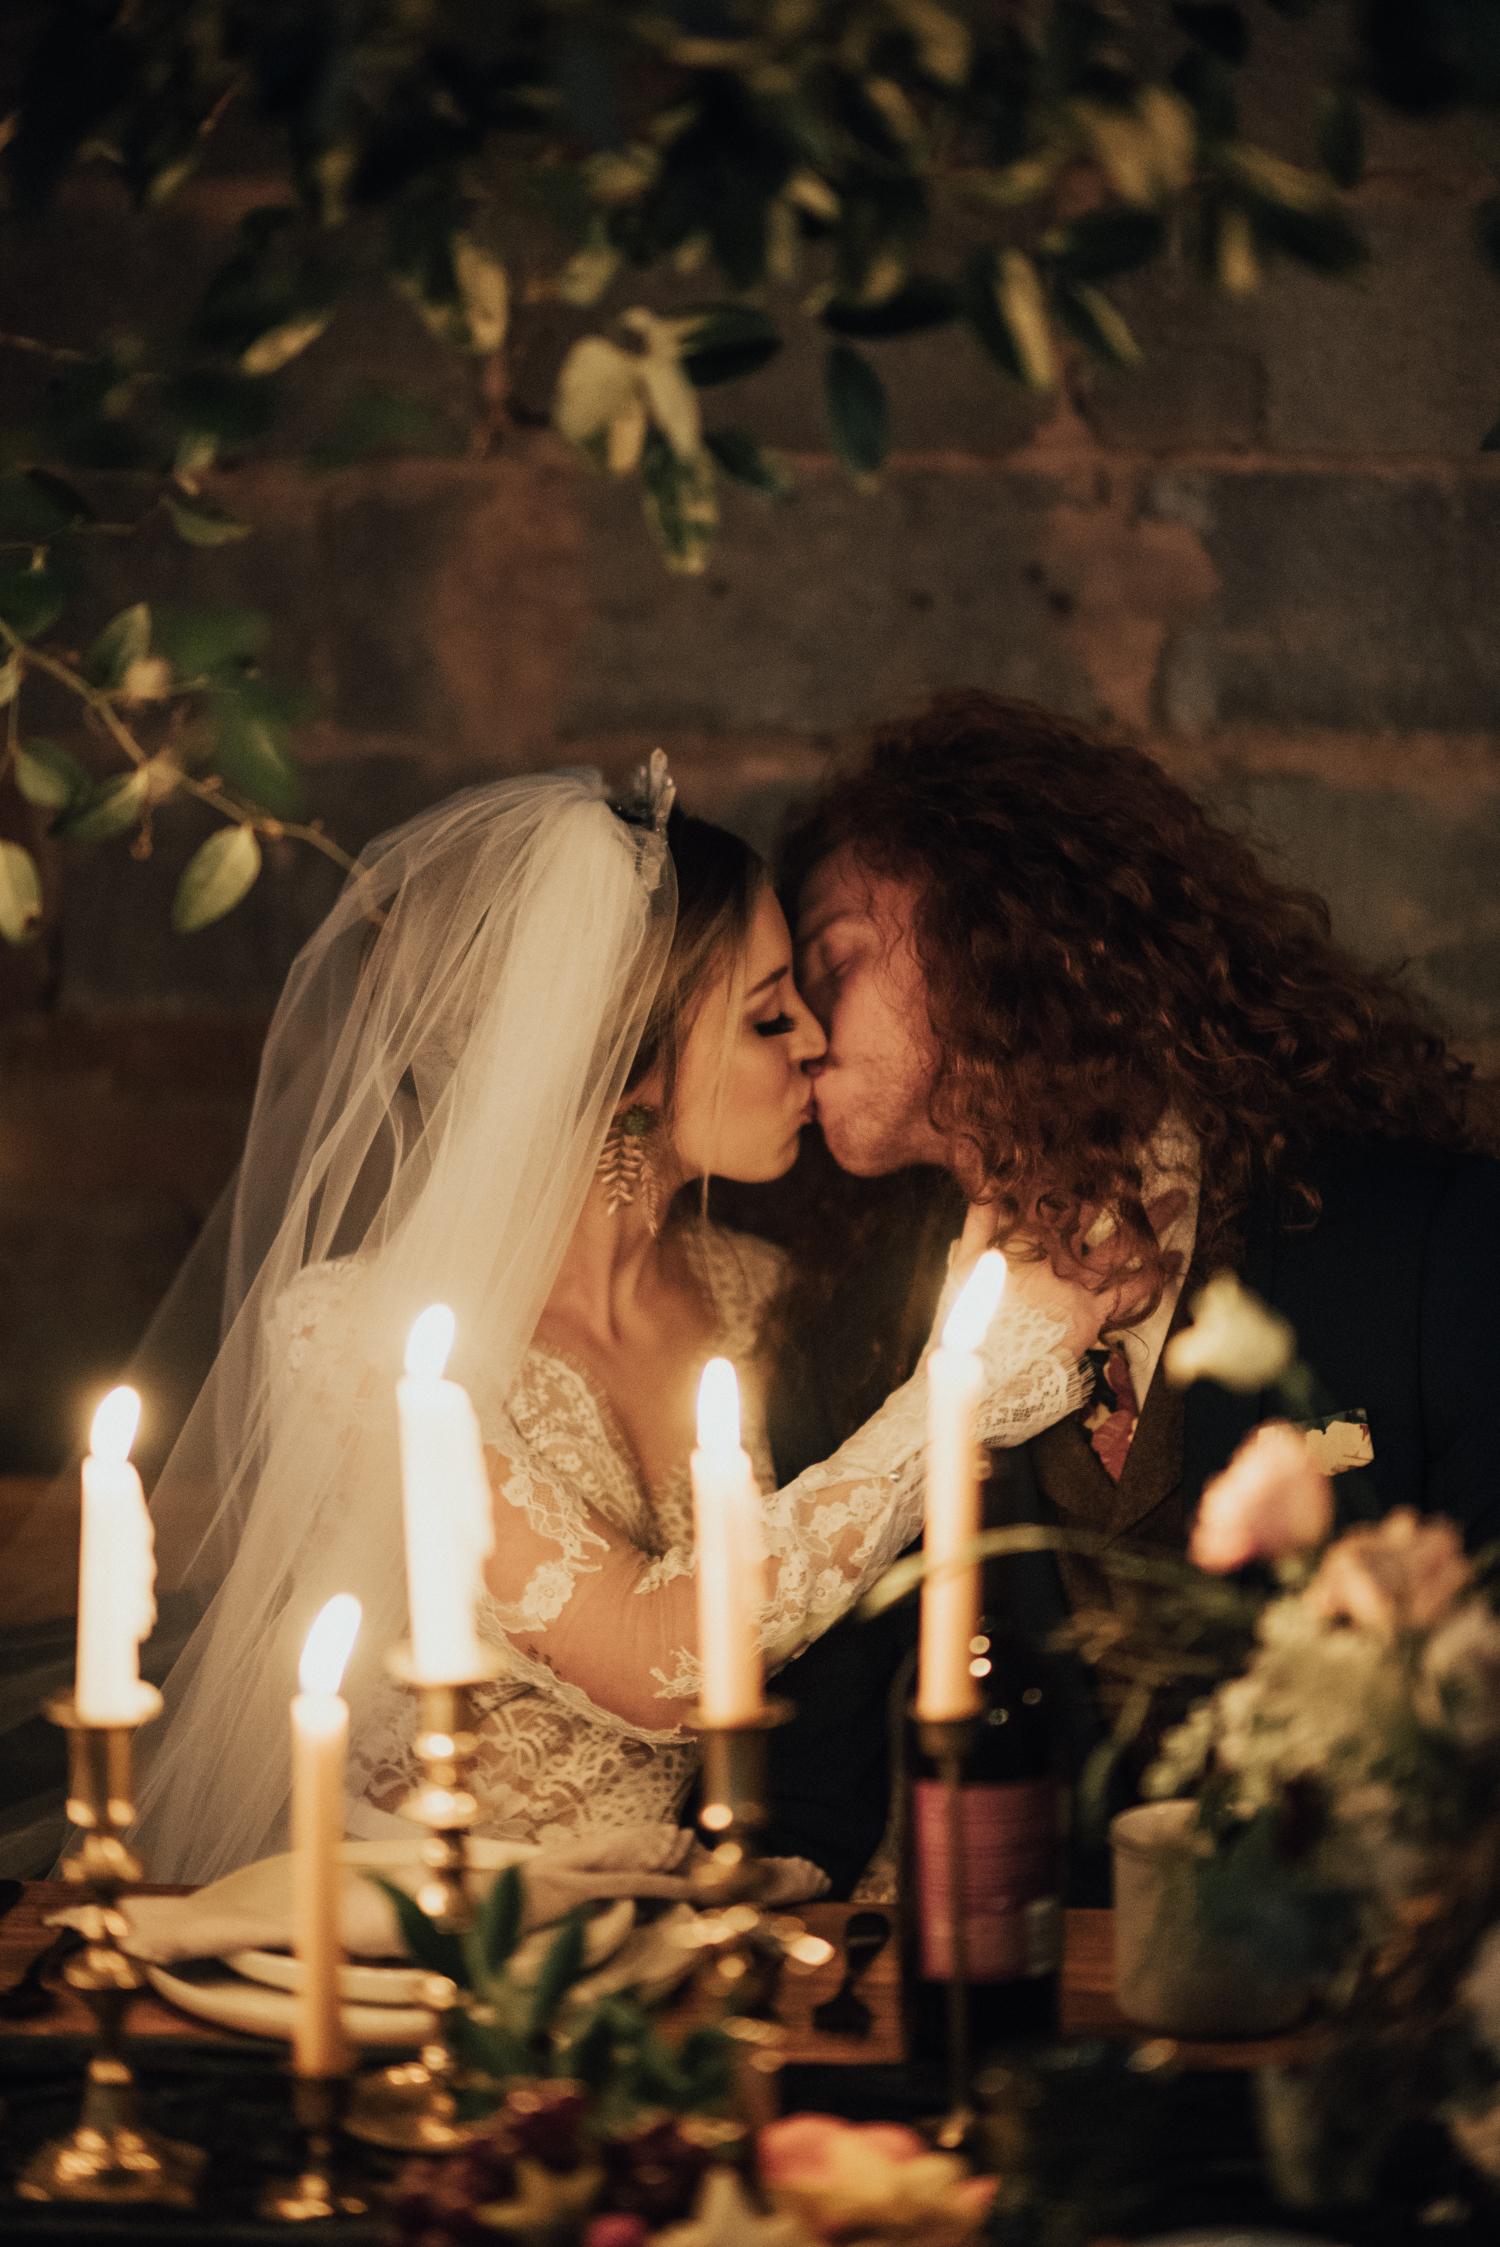 St-Louis-wedding-photographers-102.jpg